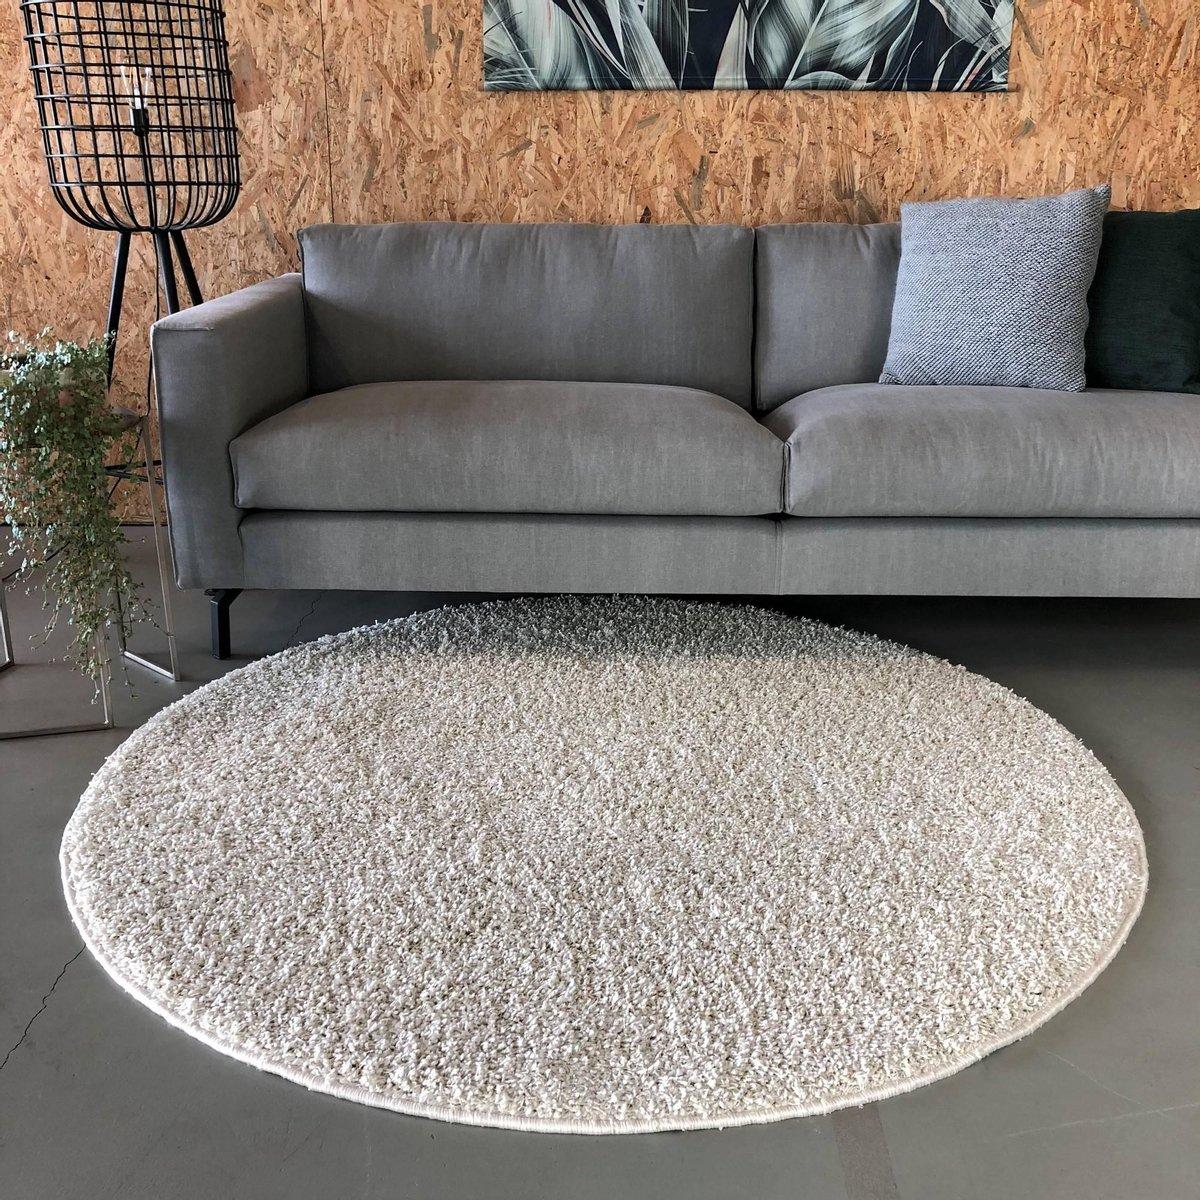 Hoogpolig Rond Vloerkleed Wit - Shaggy Collection - 160 cm (M) - Polypropyleen - 160 Ø - (M) - Interieur 05